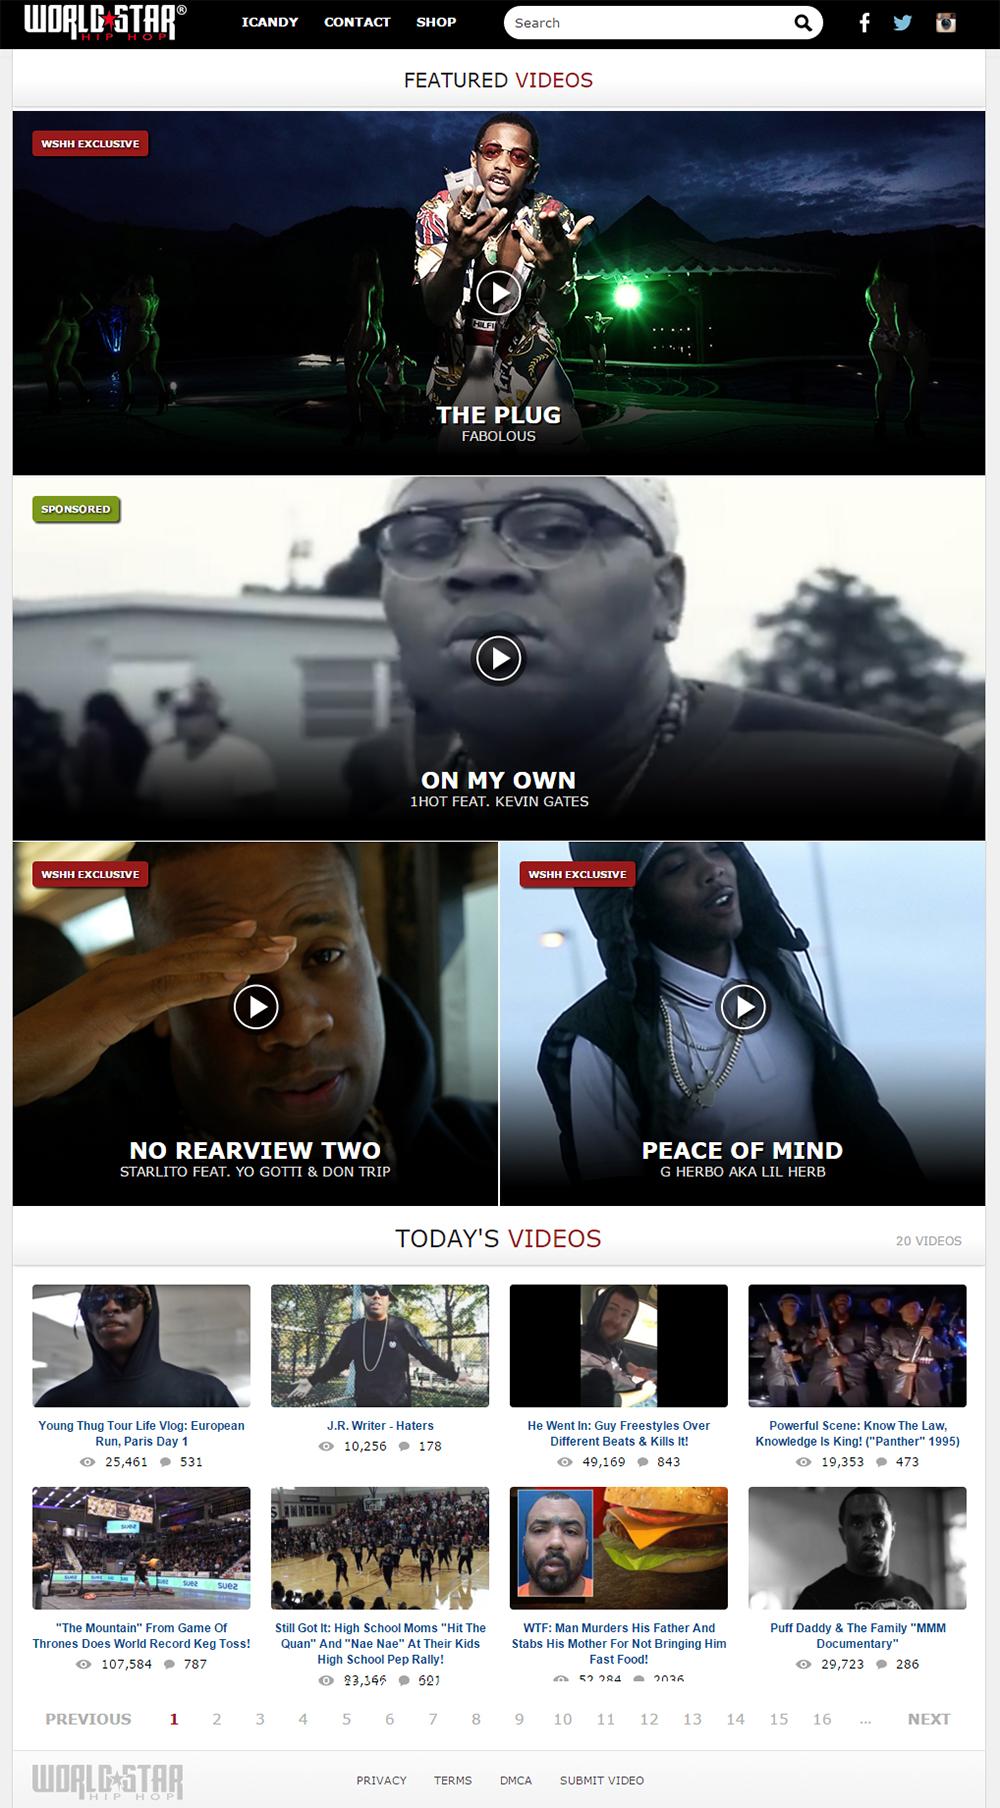 jr writer haters official music video world star hip hop masar tv